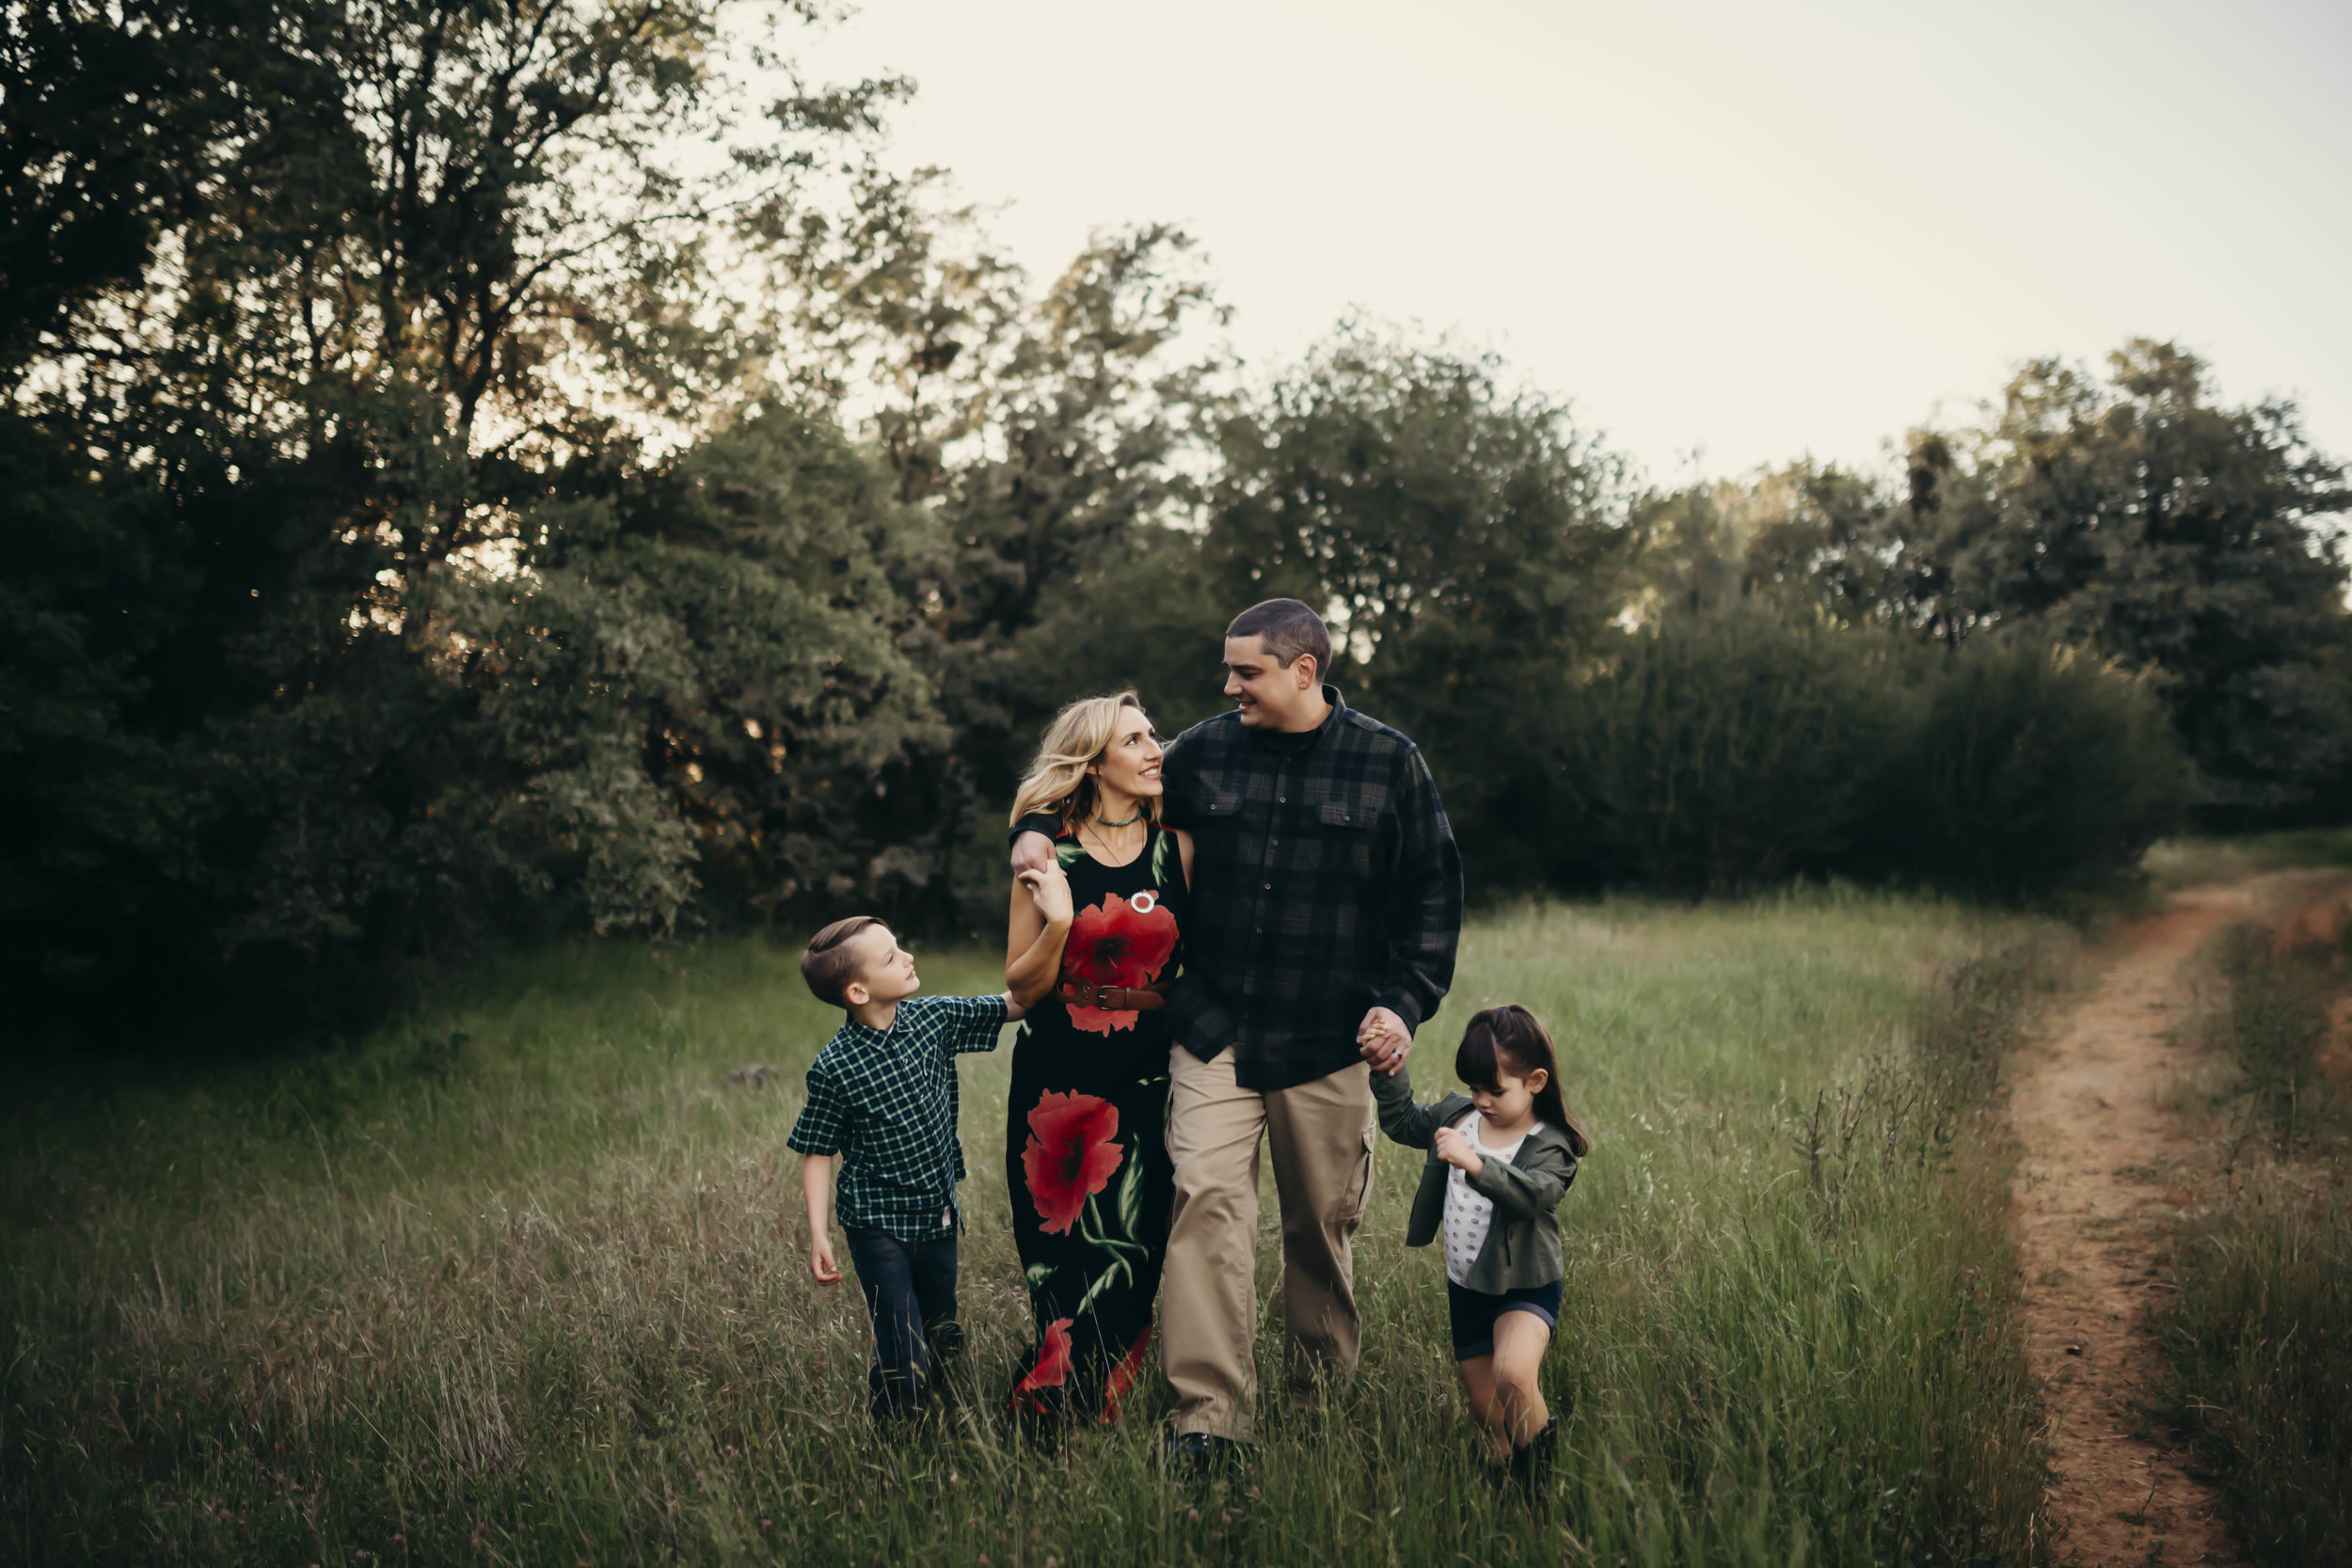 Families & Couples - $150 & UpBlah Blah Blah